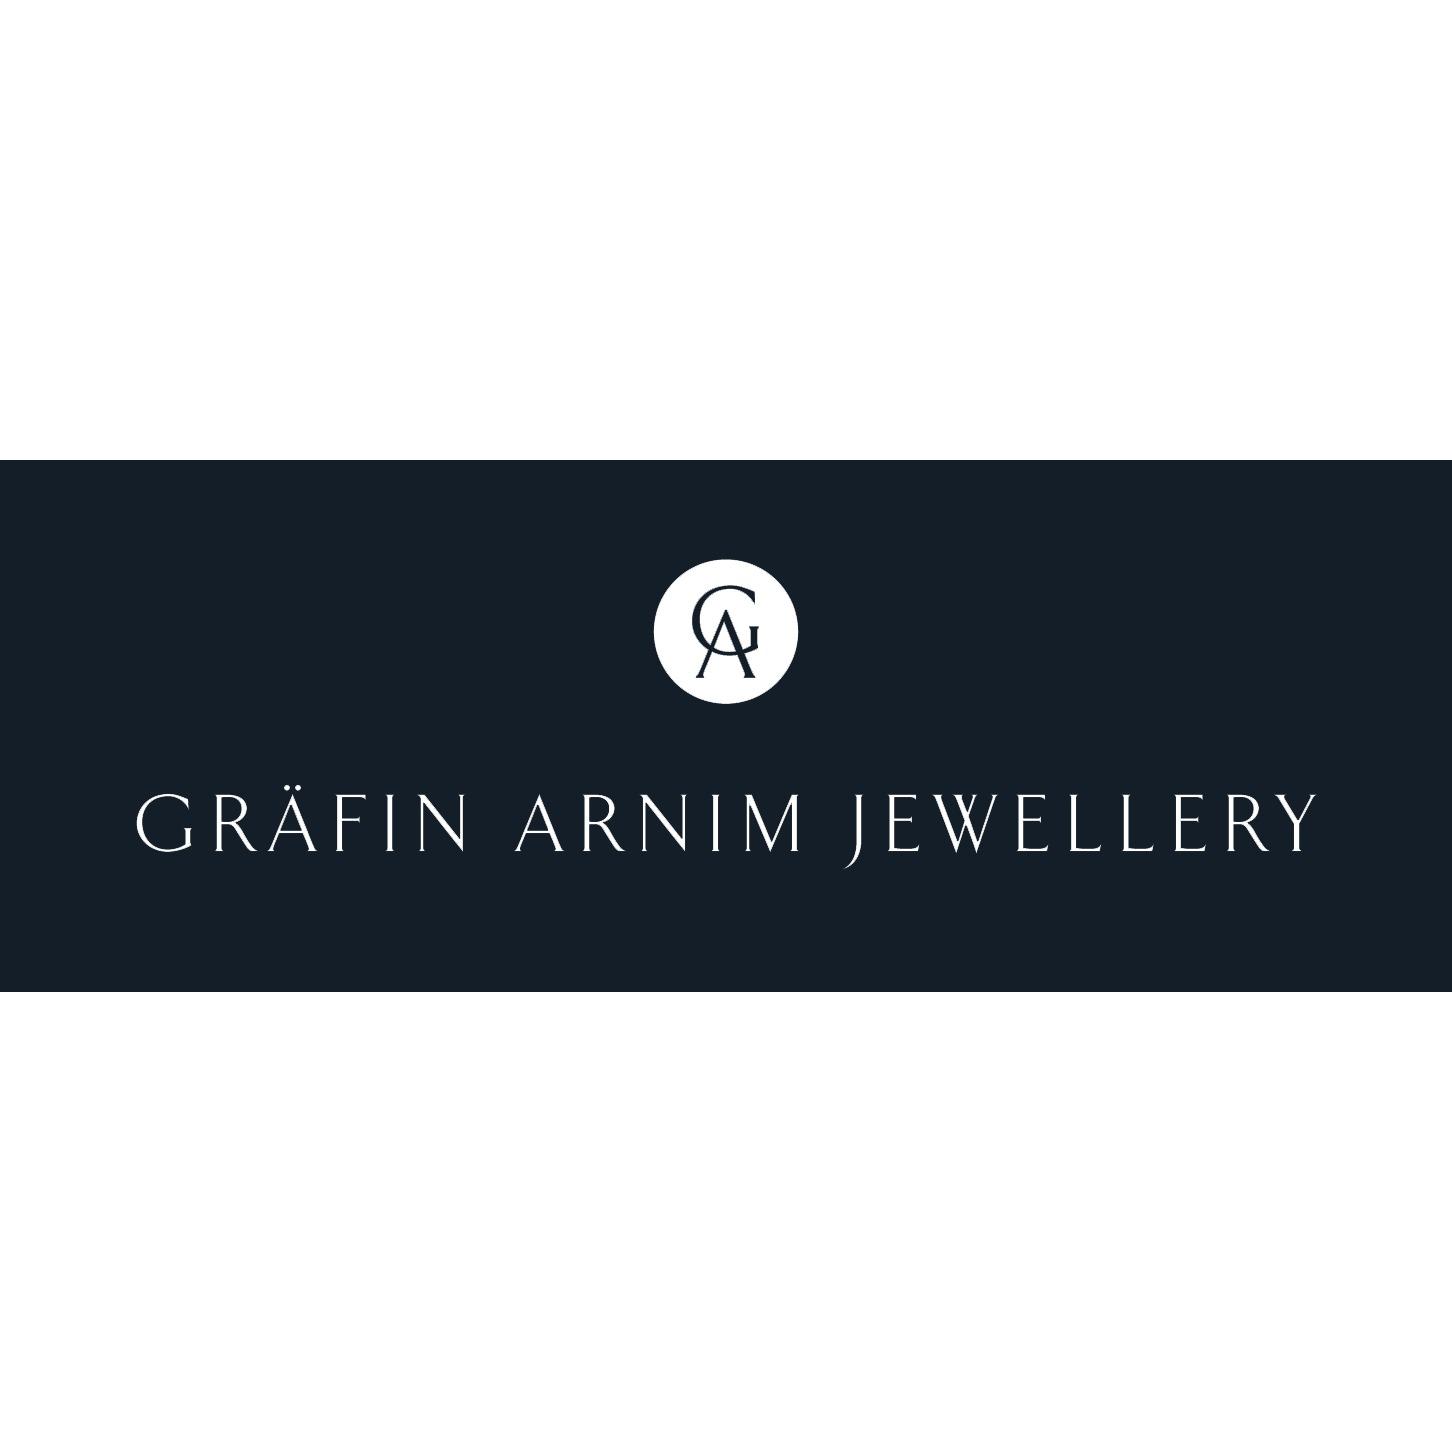 Gräfin Arnim Jewellery GmbH   Bonn   Bad Godesberg